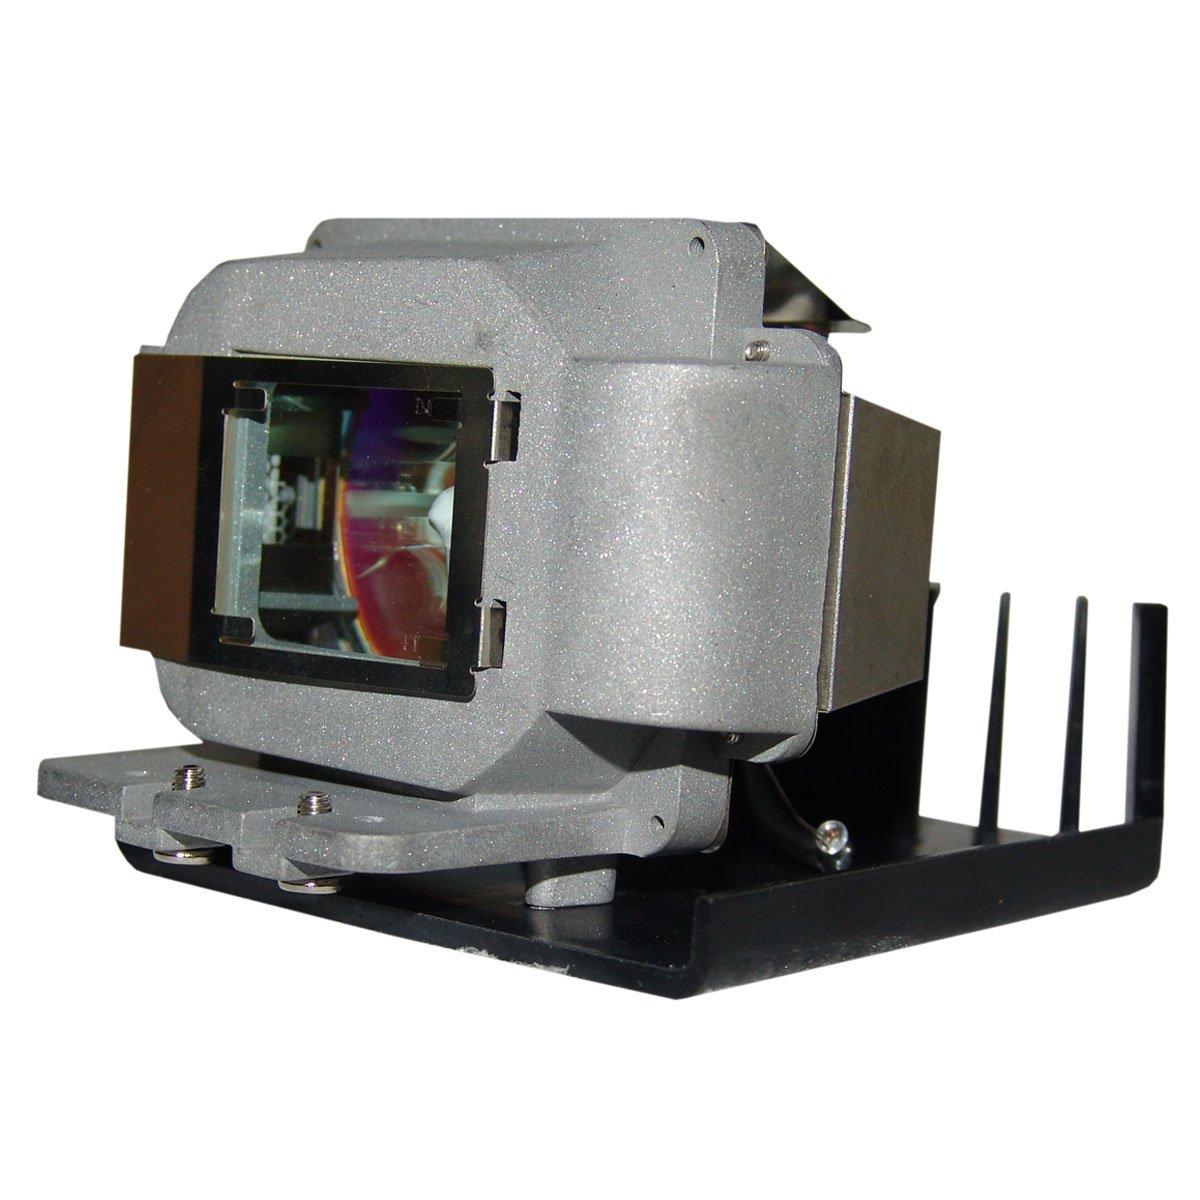 PJ551D プロジェクター交換用ランプ ハウジング付き Viewsonic プロジェクター用   B00D2HOW0M